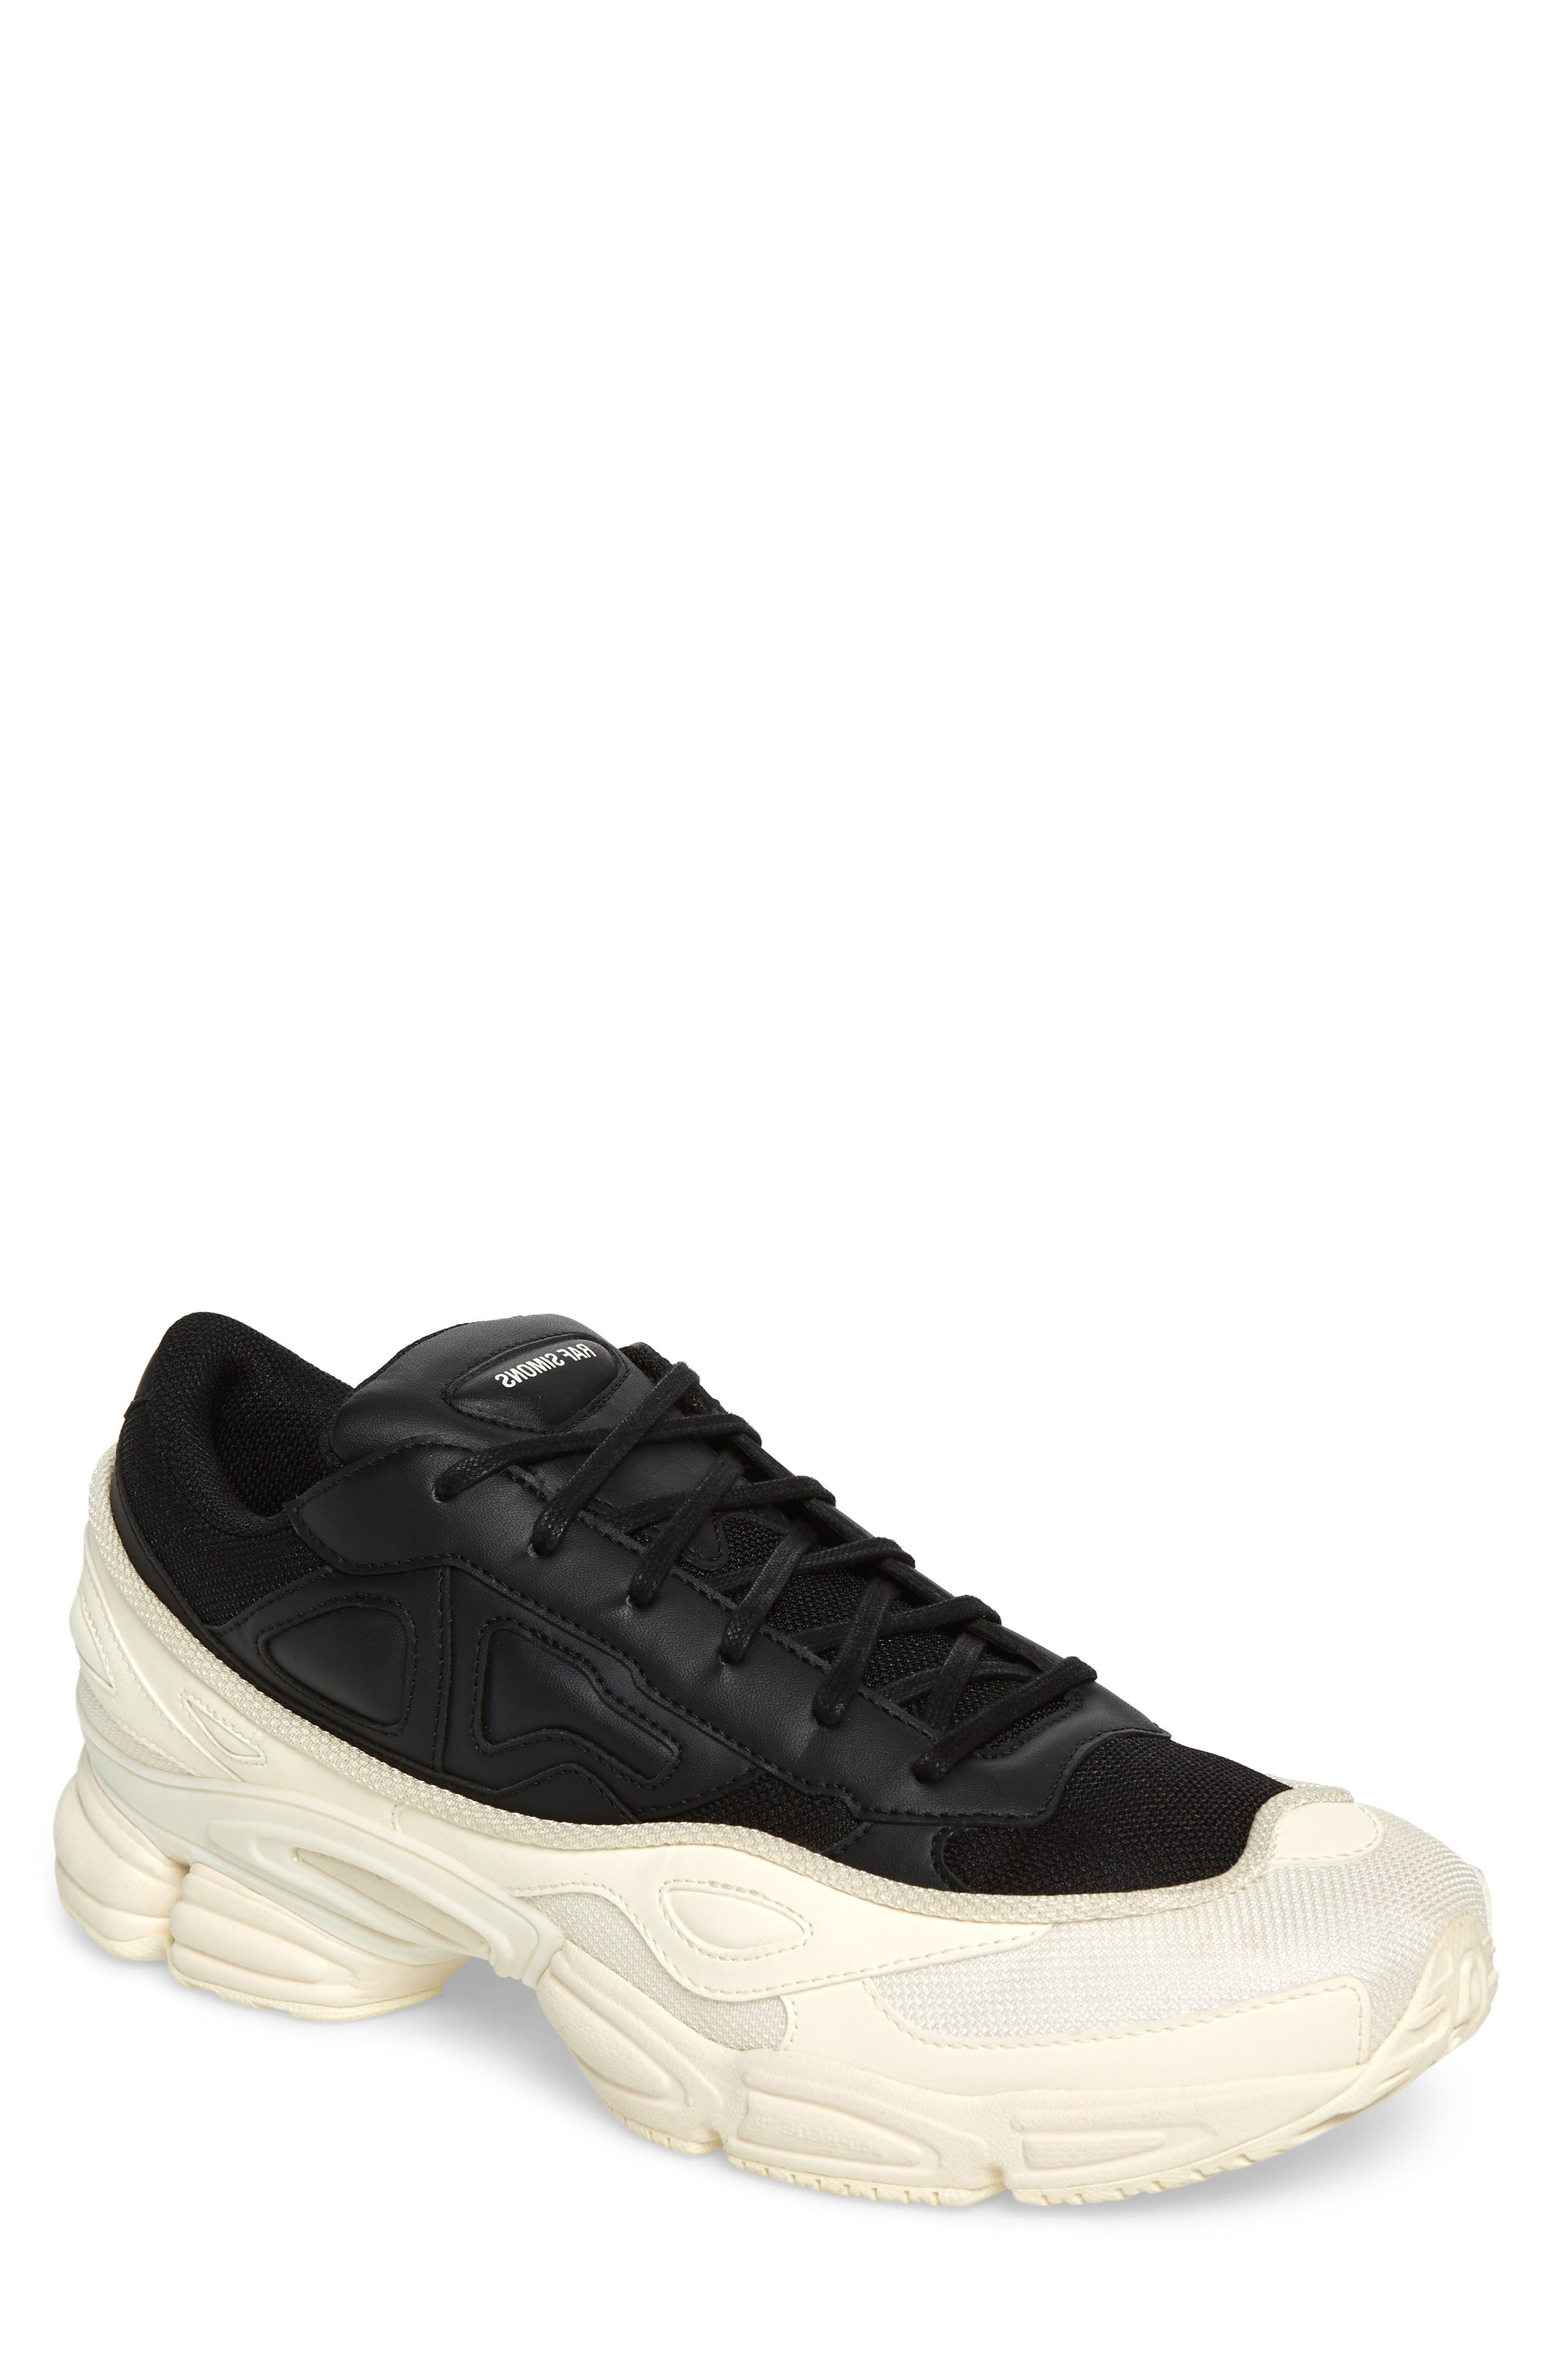 adidas by Raf Simons Ozweego III Sneaker,                             Main thumbnail 1, color,                             CREAM WHITE/ CORE BLACK